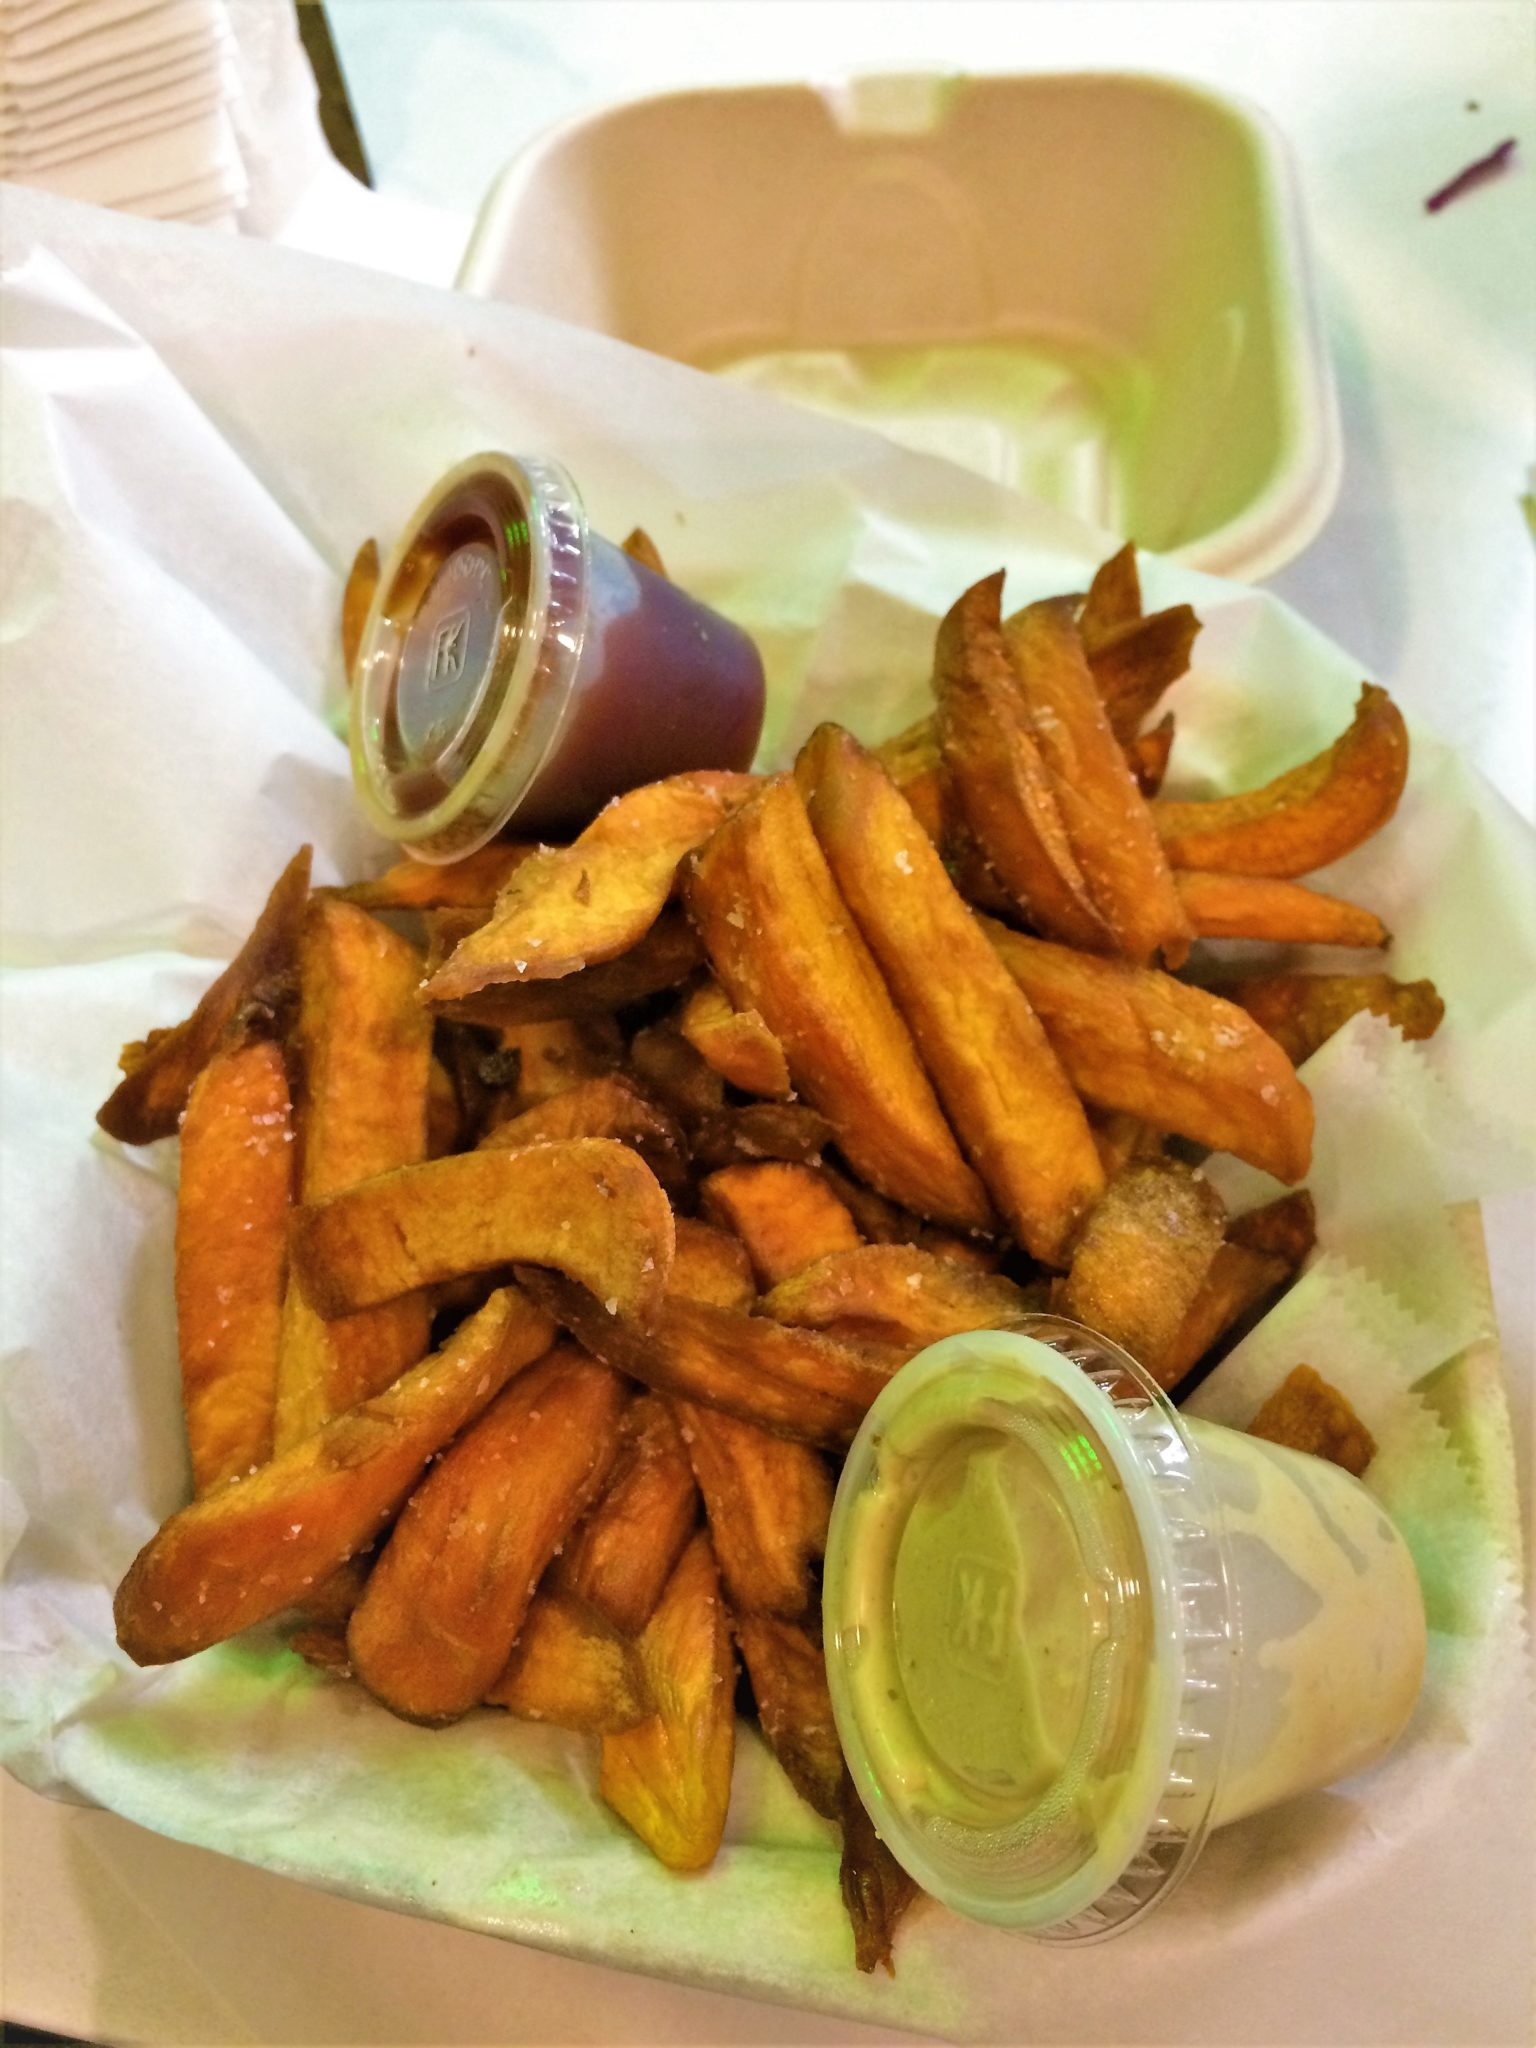 Sweet potato fries from Fala Bar, los angeles